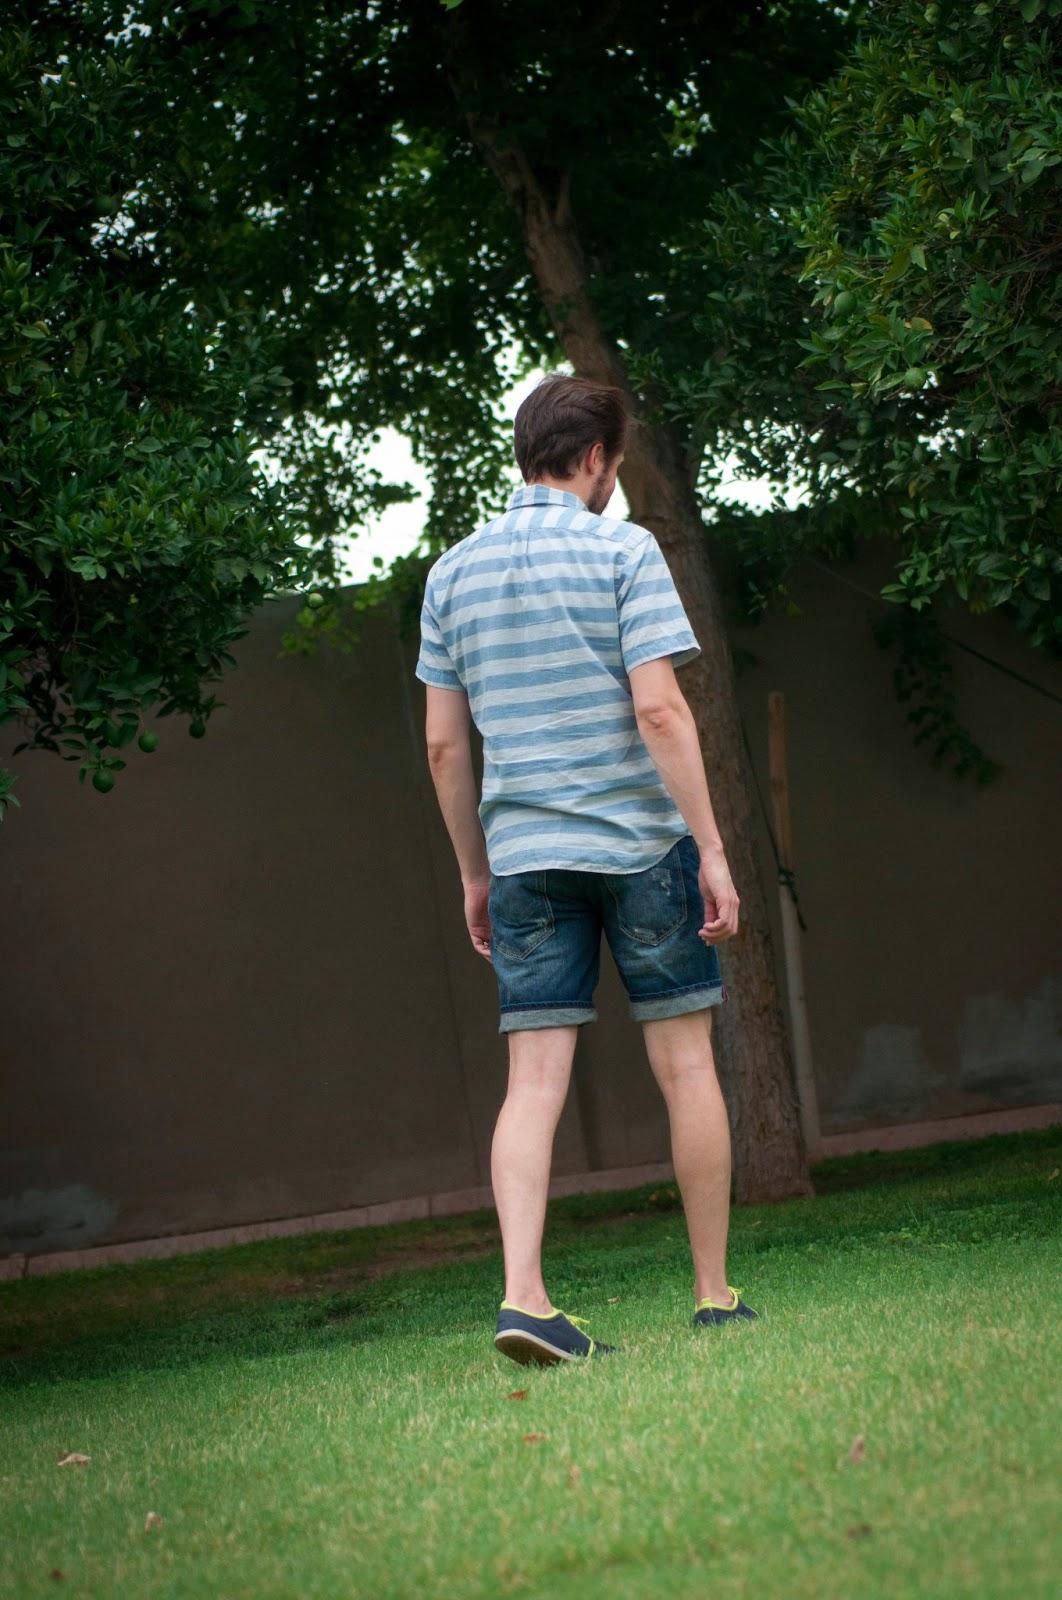 zara, zara mens, jcrew mens stripe short, jcrew pop over sleeve shirt in stripes, zara shoes, mens style blog, mens fashion blog, ootd